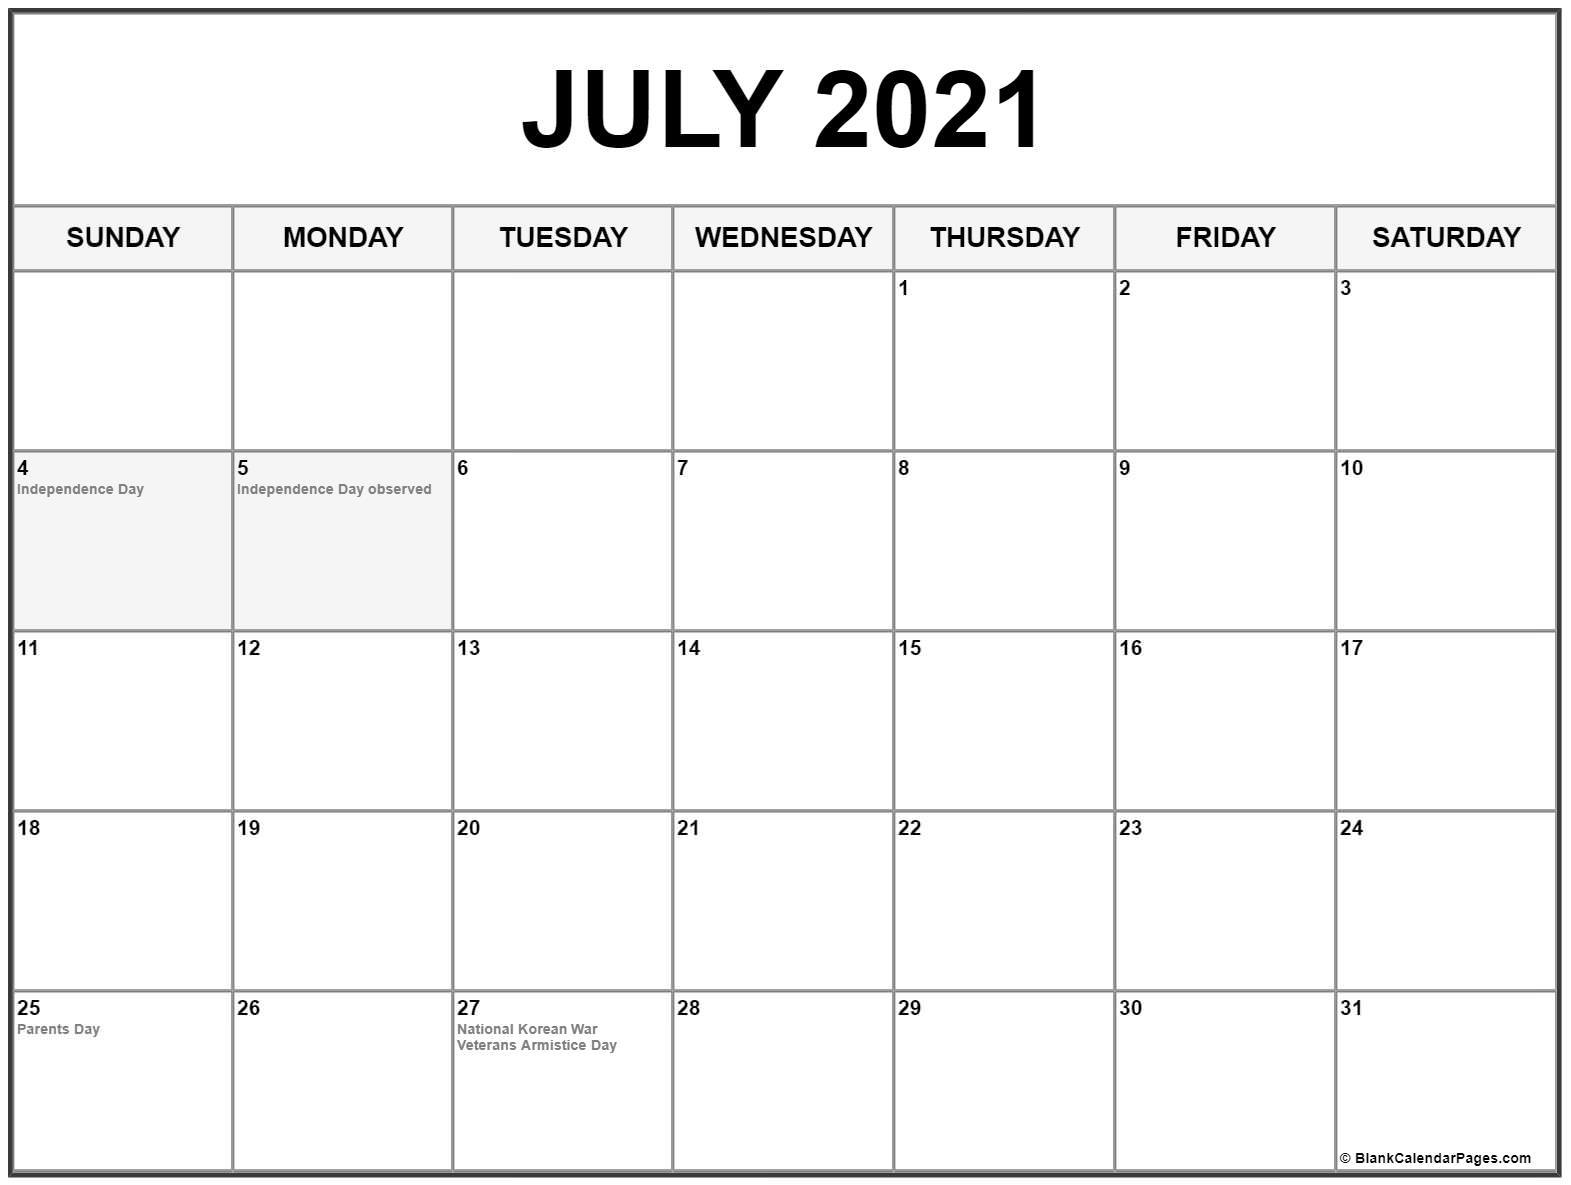 2021 Canadian Calendar With Holidays